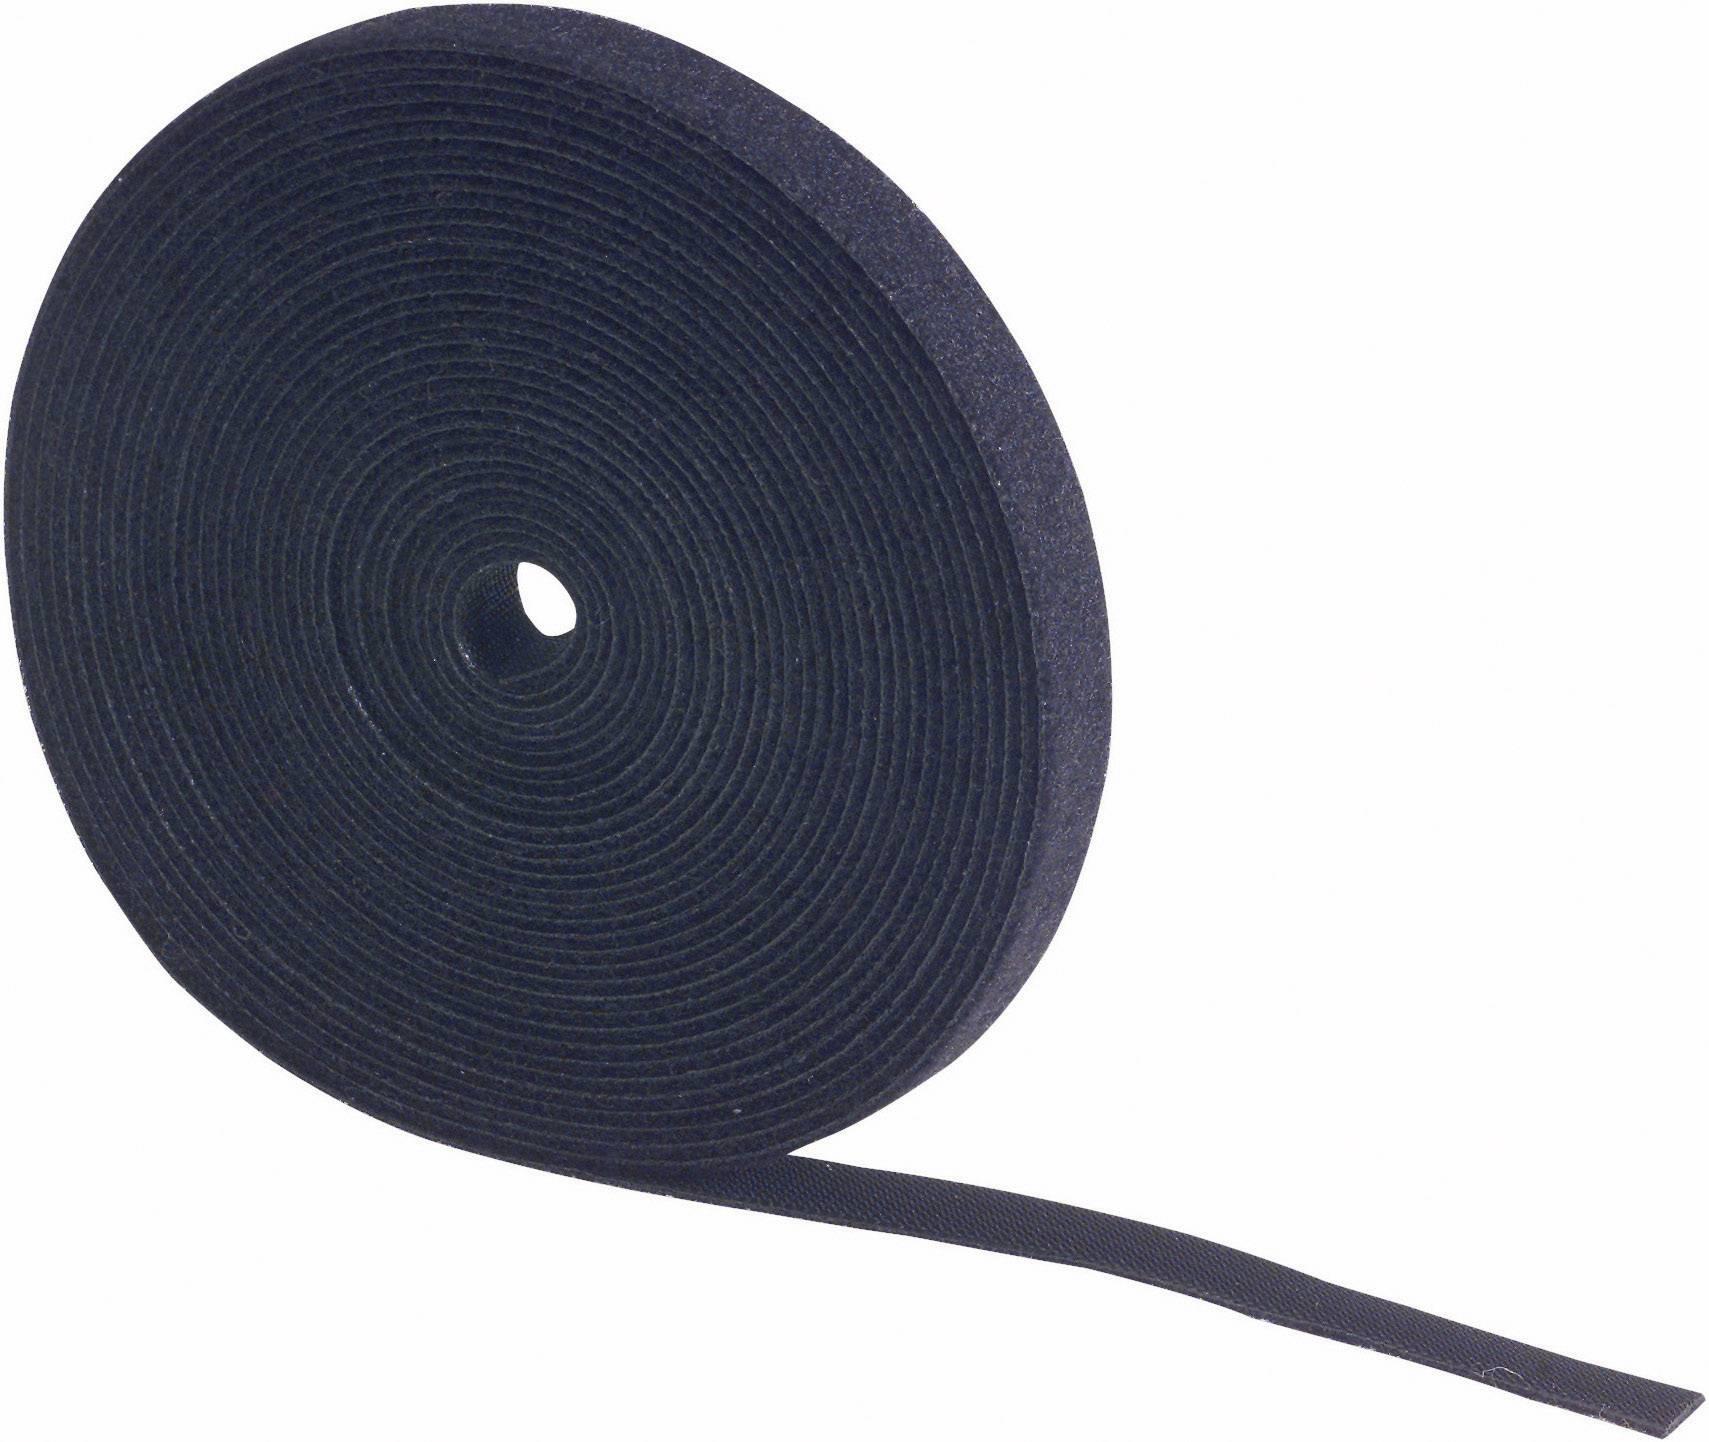 Pásek se suchým zipem Fastech 696-650, (d x š) 5000 mm x 10 mm, zelená, 5 m